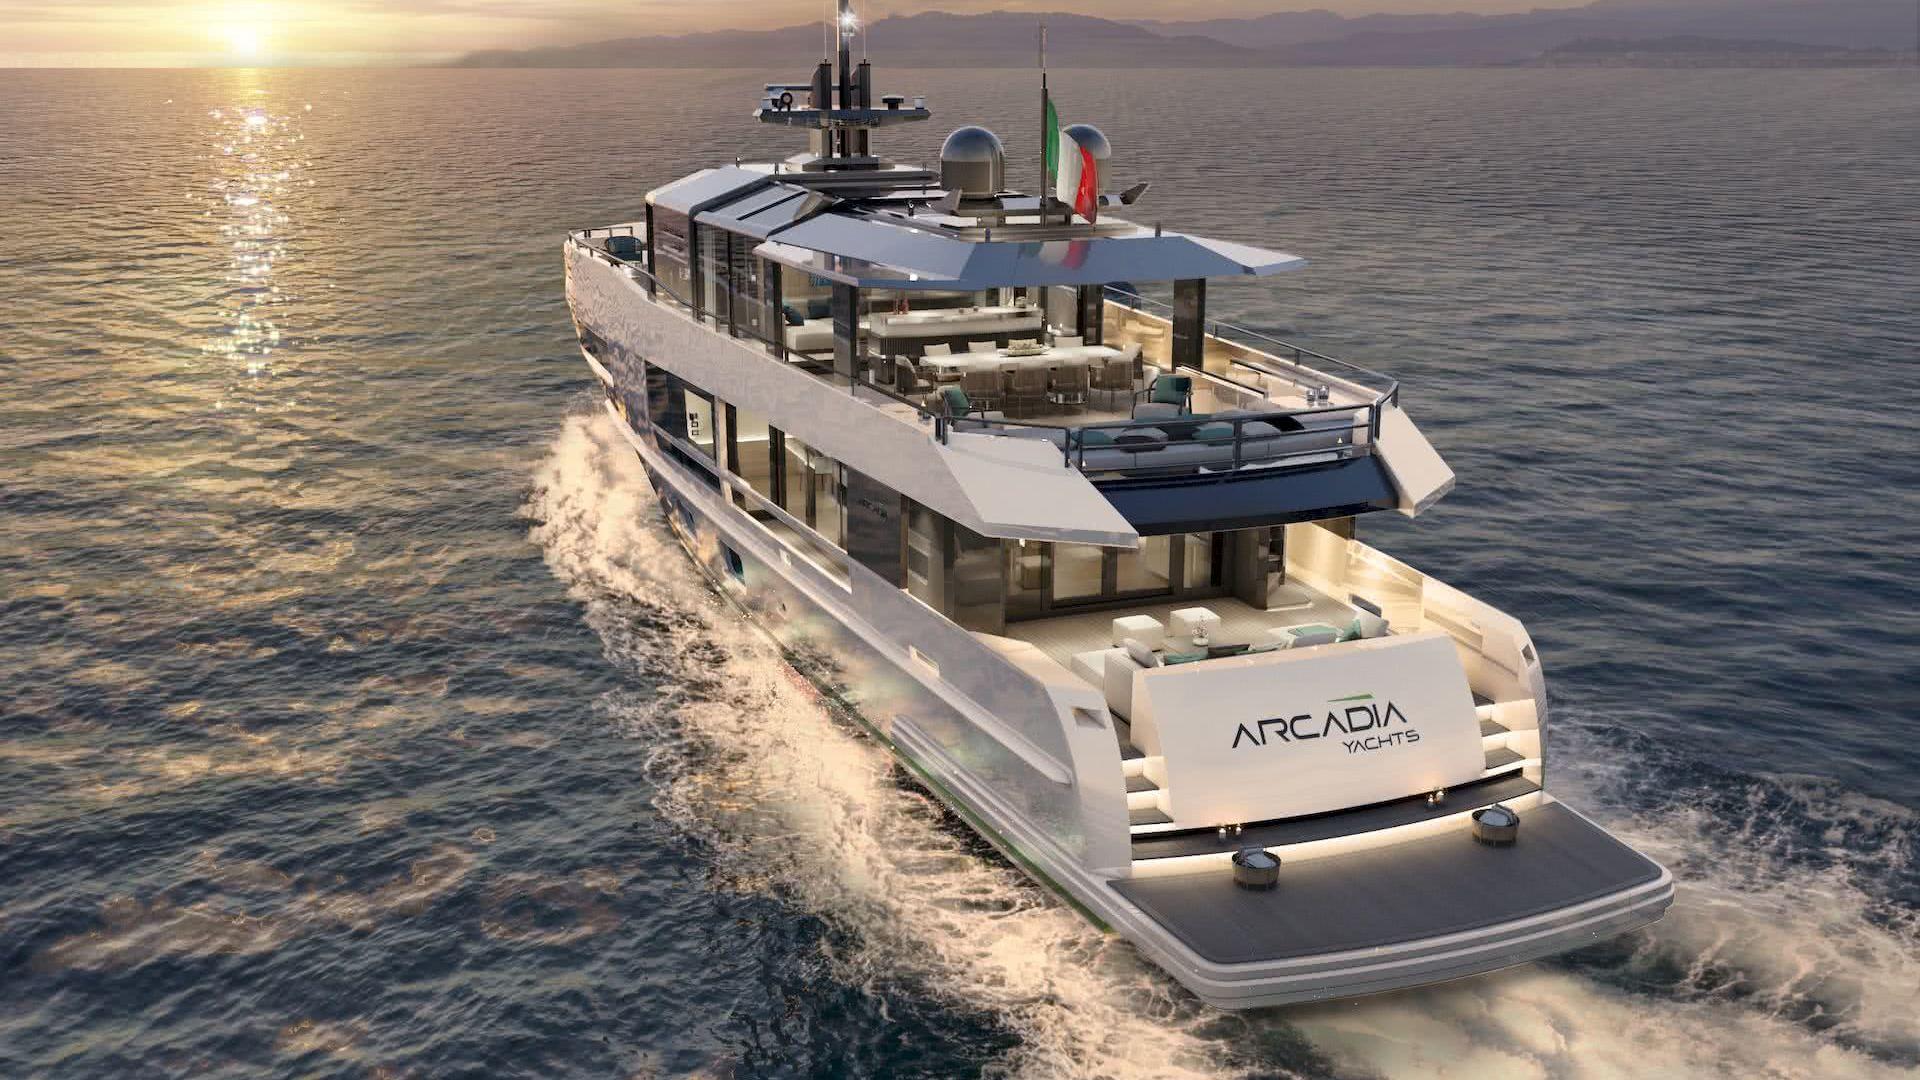 Arcadia 115 Yacht Hot Lab Yacht Design